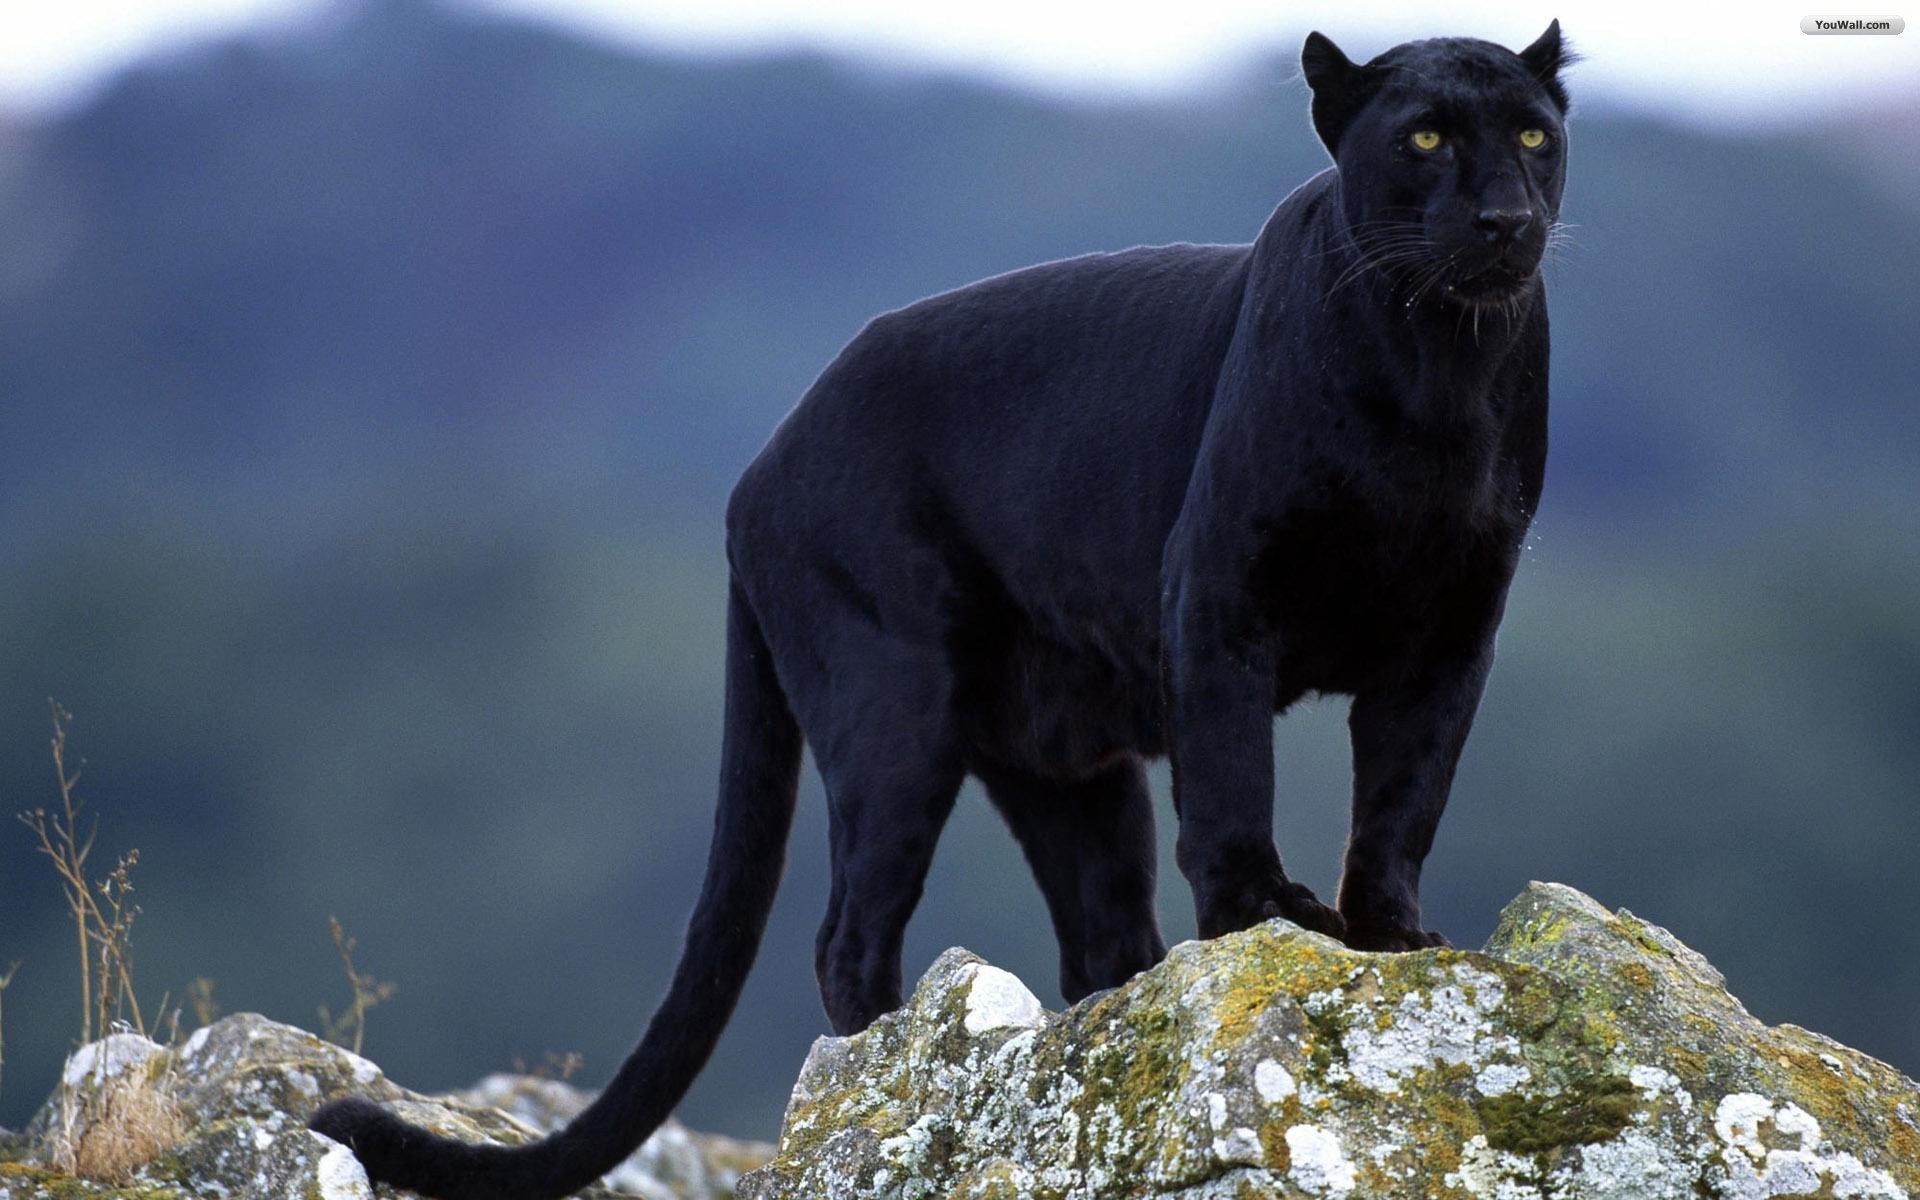 Black Jaguar Animal Wallpaper For Desktop 1920x1200